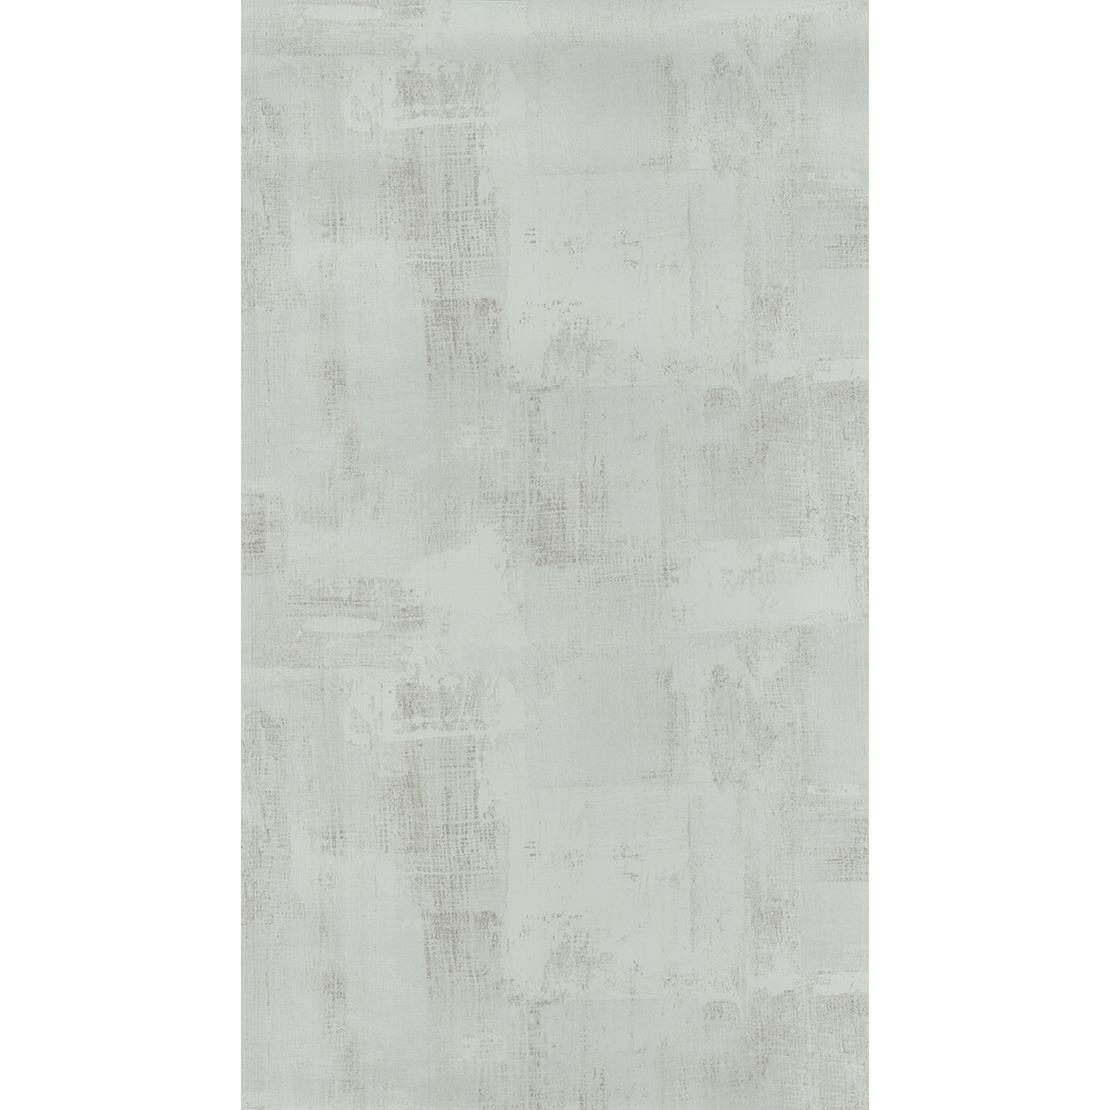 Французские обои Casadeco,  коллекция Oxyde, артикулOXY29170124